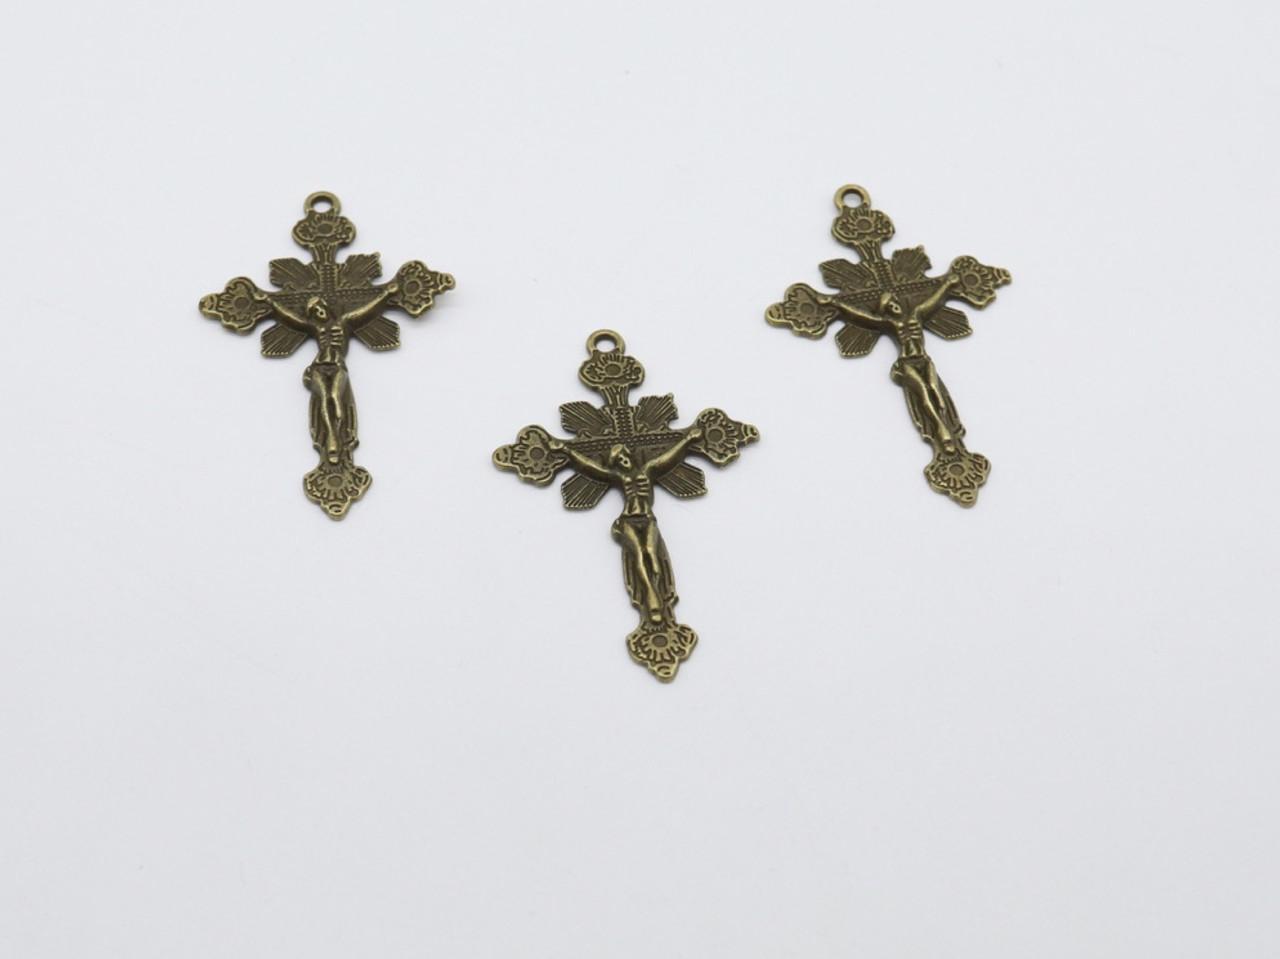 Металлические элементы. Крест. Цвет античная бронза. 45х30мм